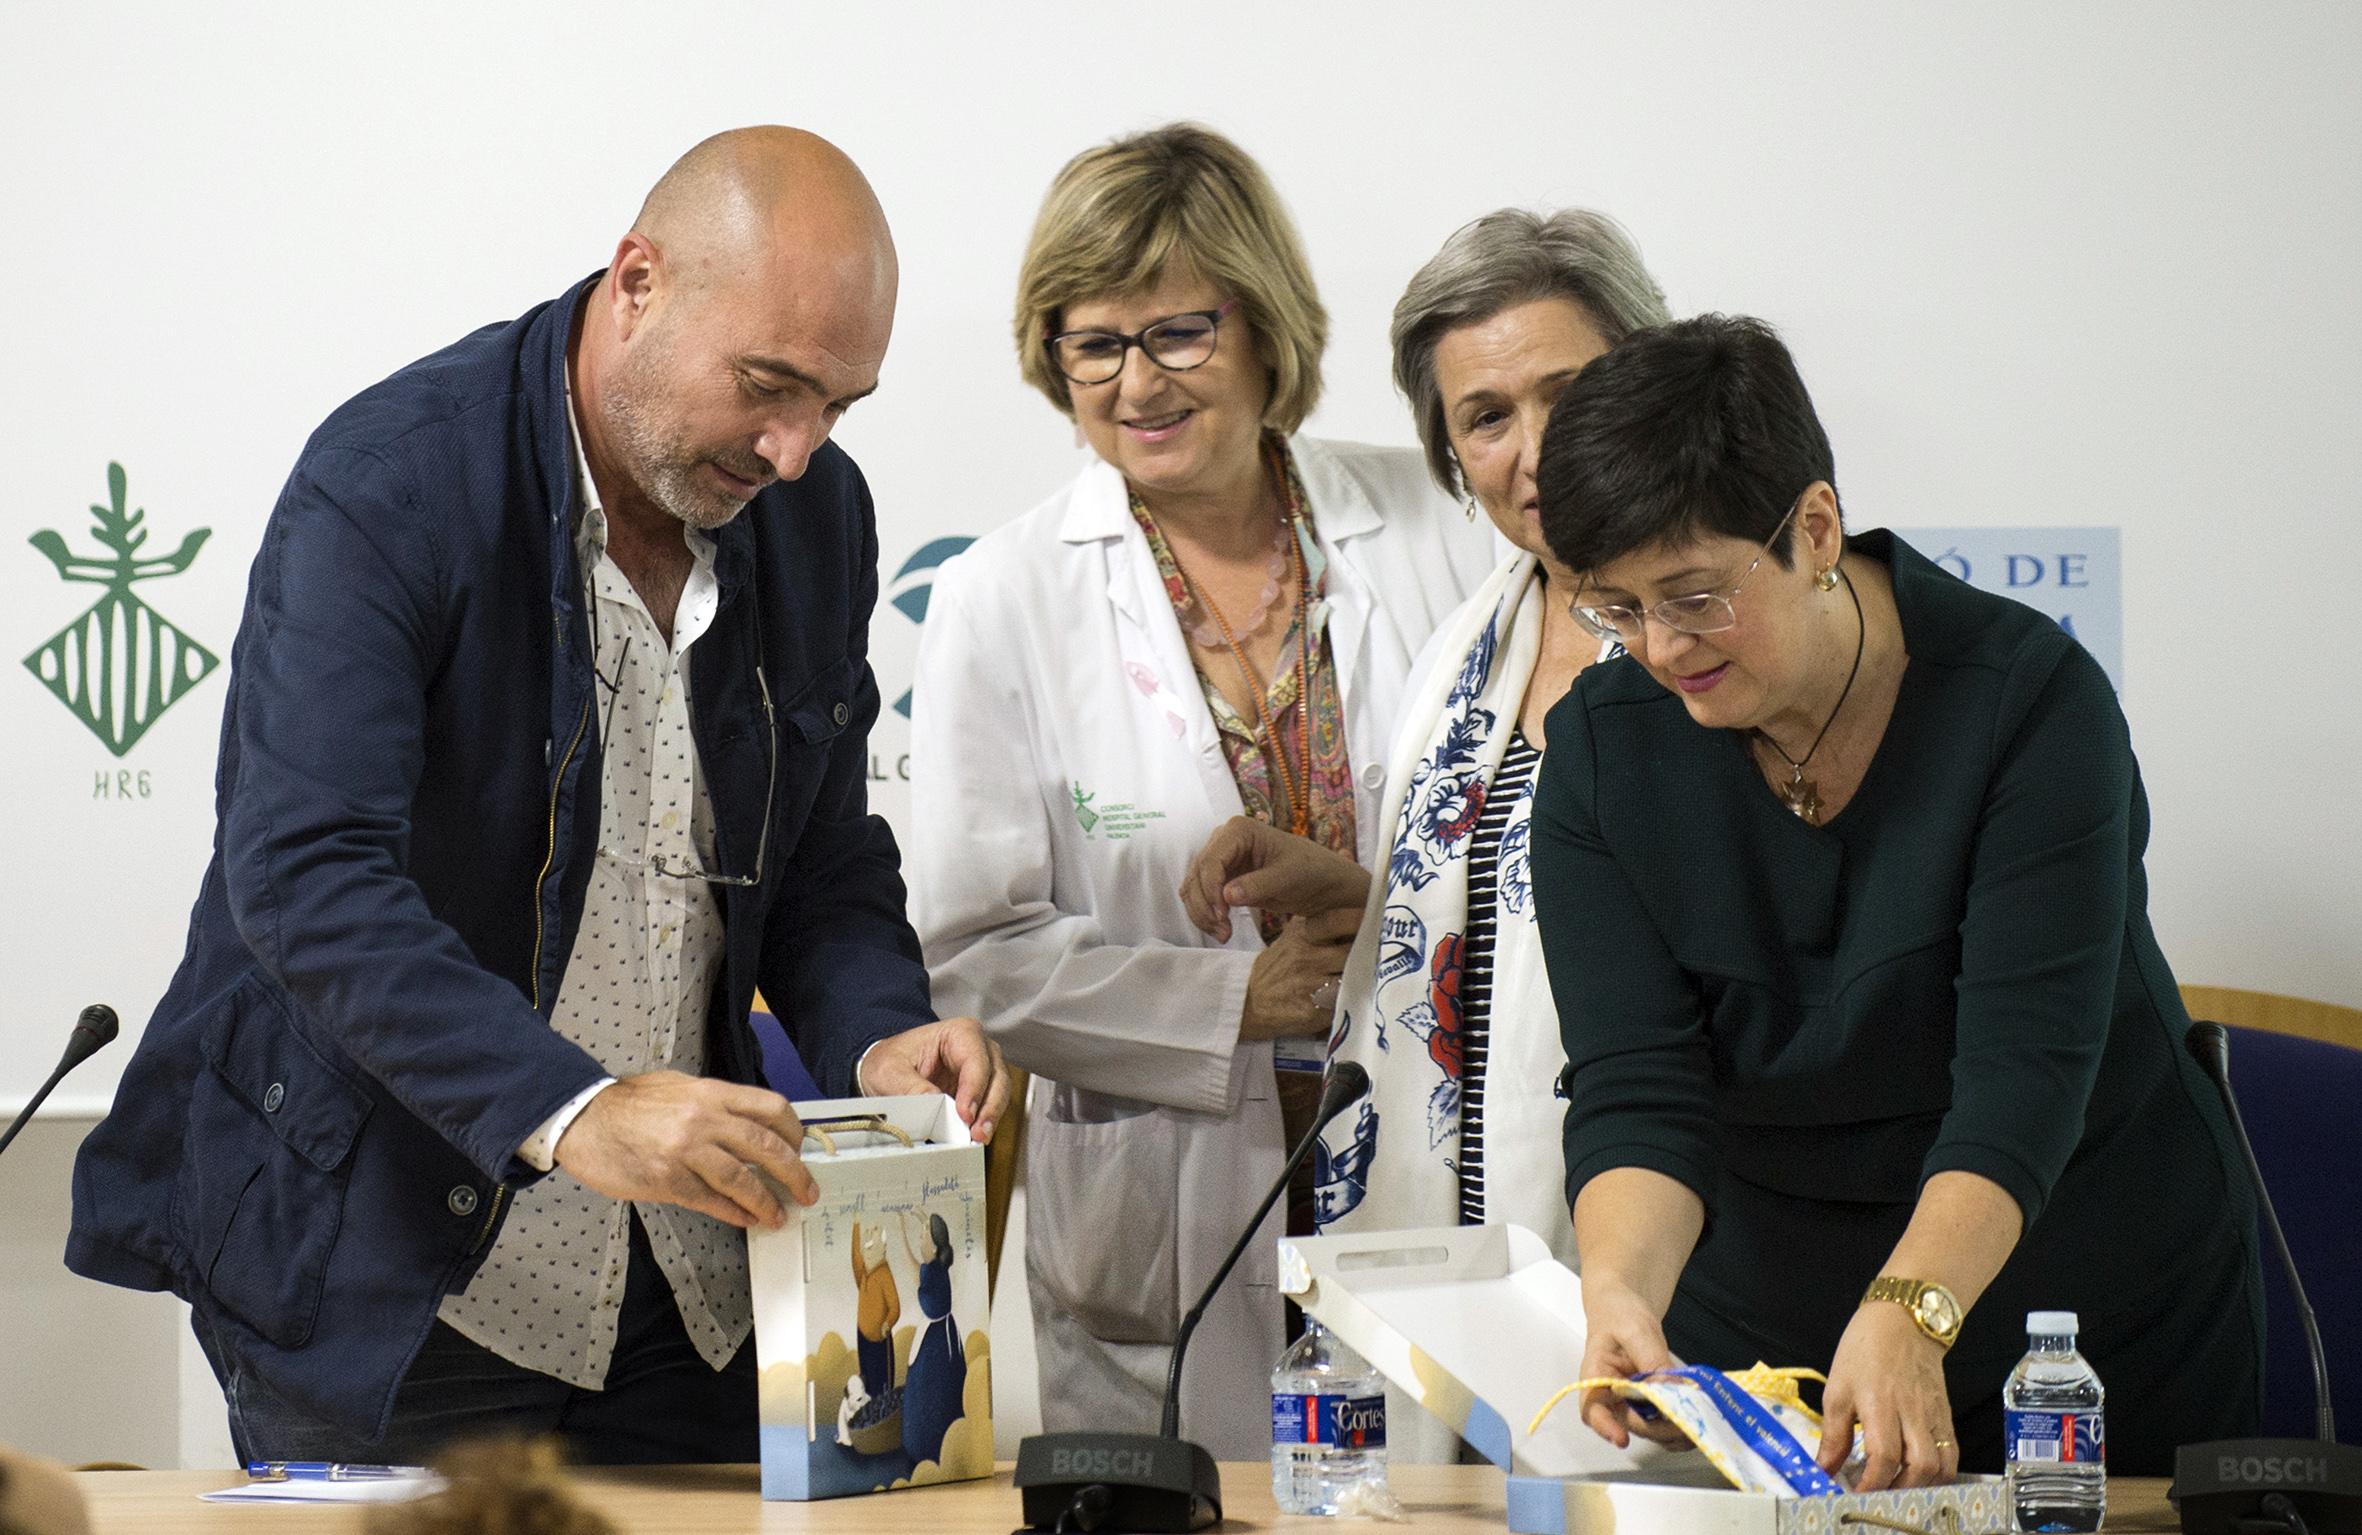 Rius presenta 'Bressolant' en Hospital General foto_Abulaila (6)